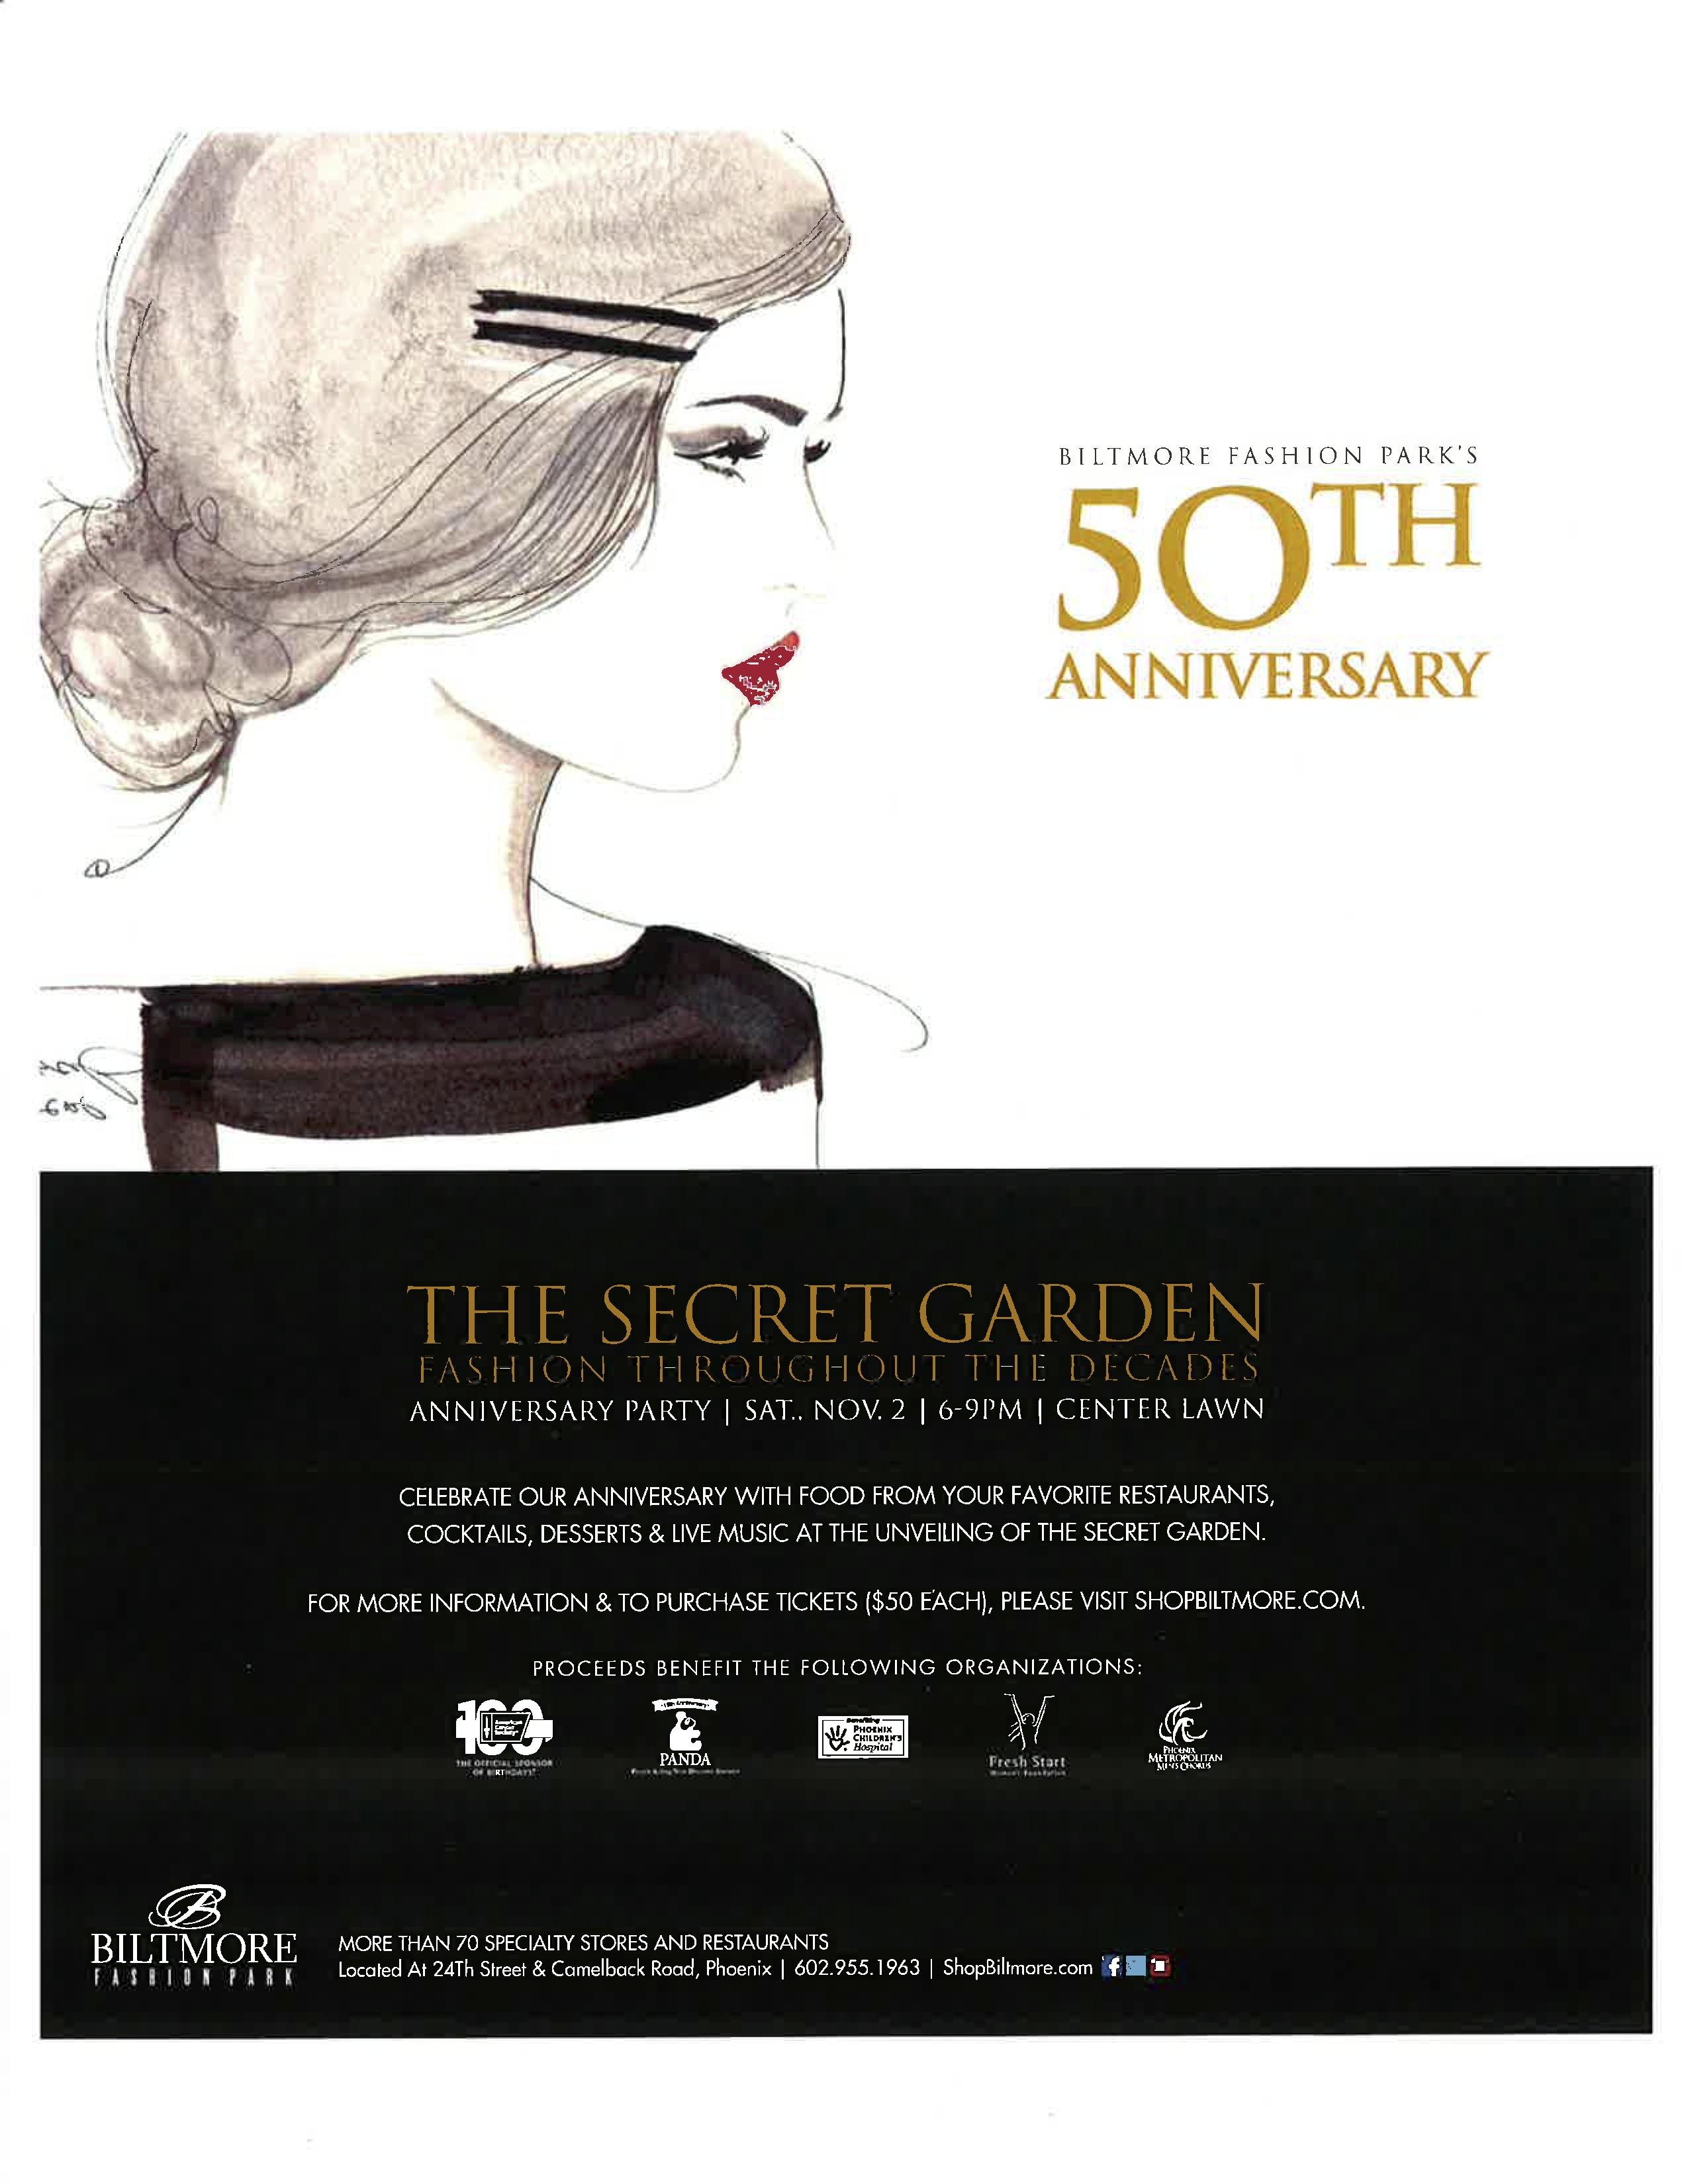 Biltmore Fashion Park Turns 50